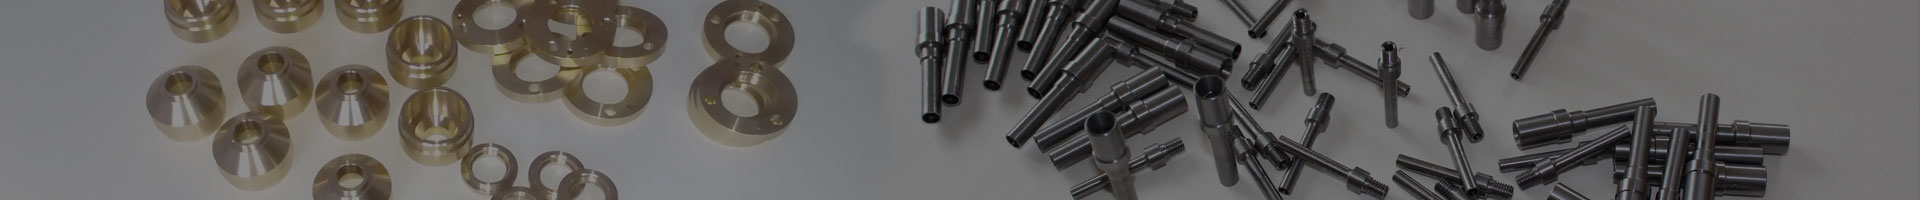 slidersmall - Frezowanie CNC